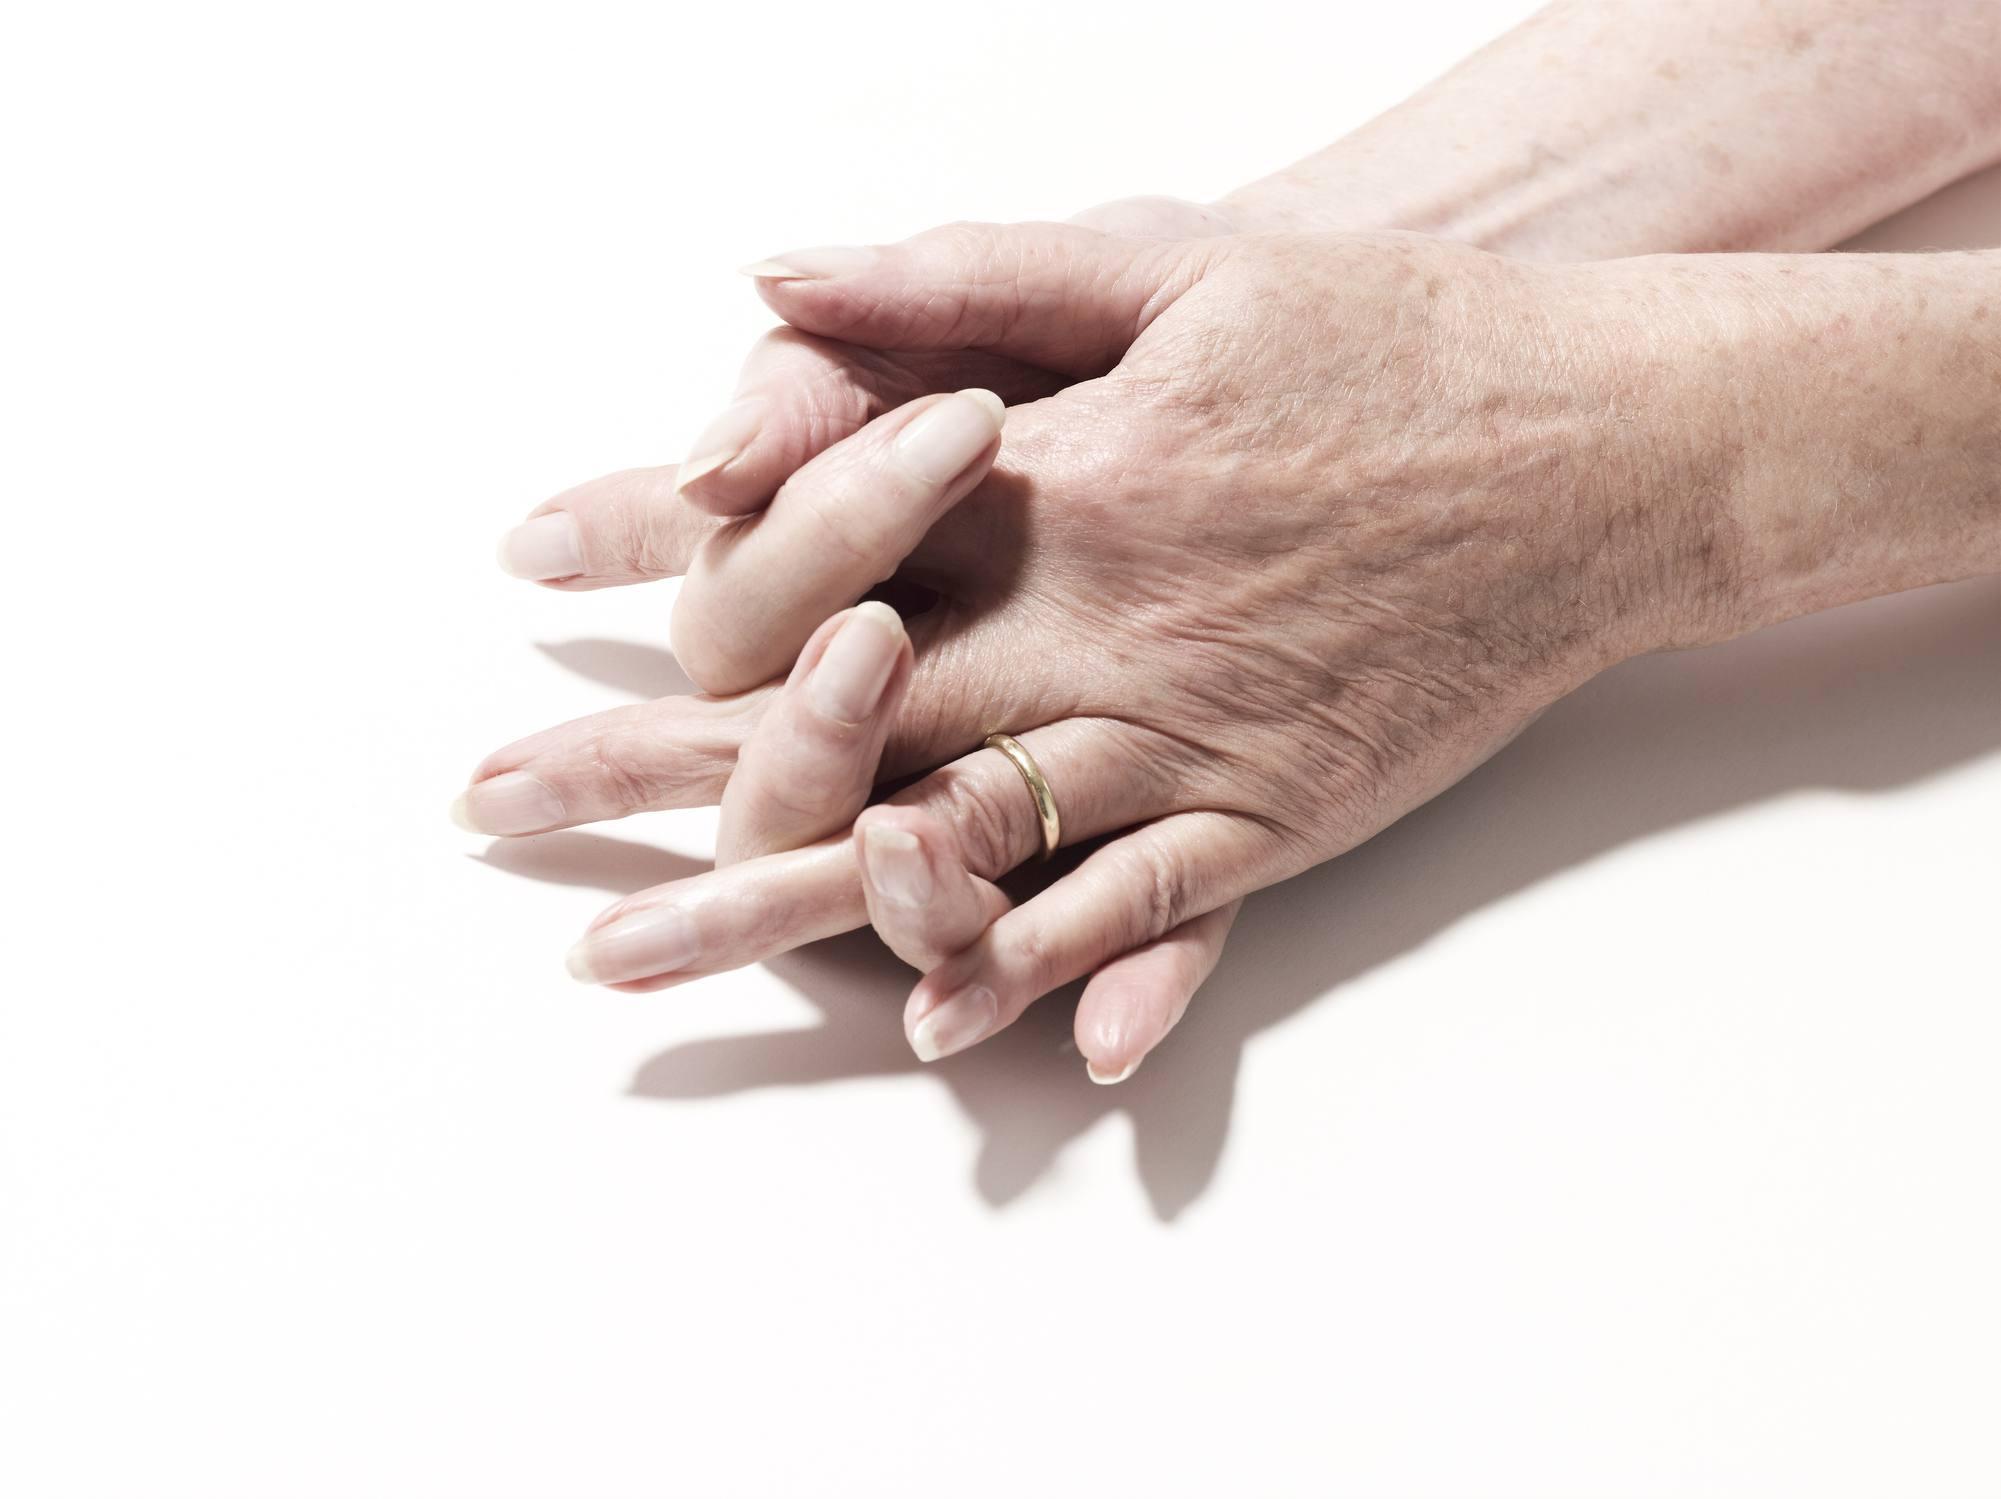 White Spots On Skin Idiopathic Guttate Hypomelanosis